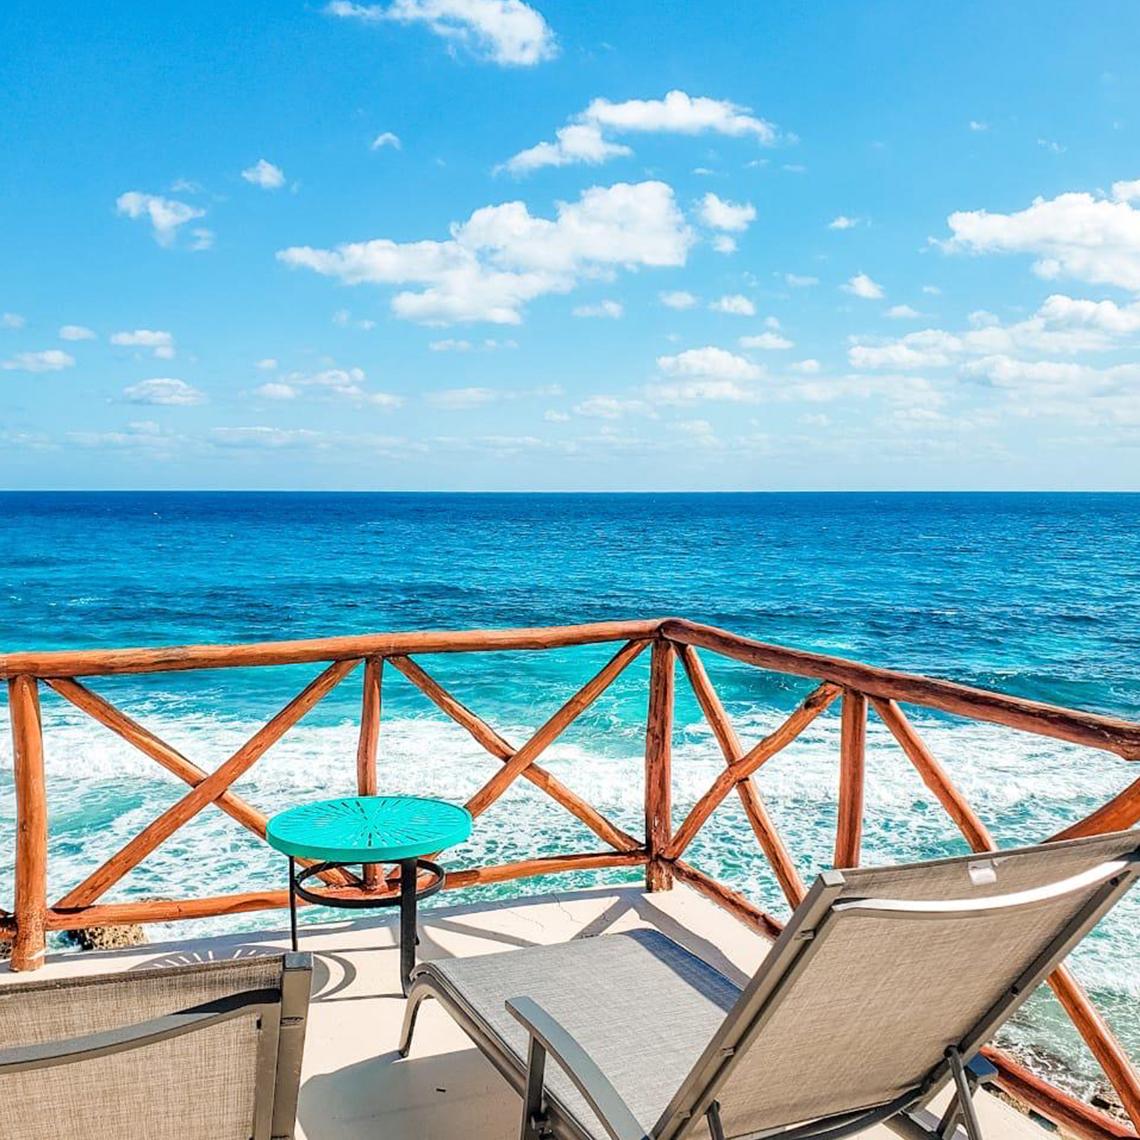 Esduma Perla del Caribe hotel Isla Mujeres